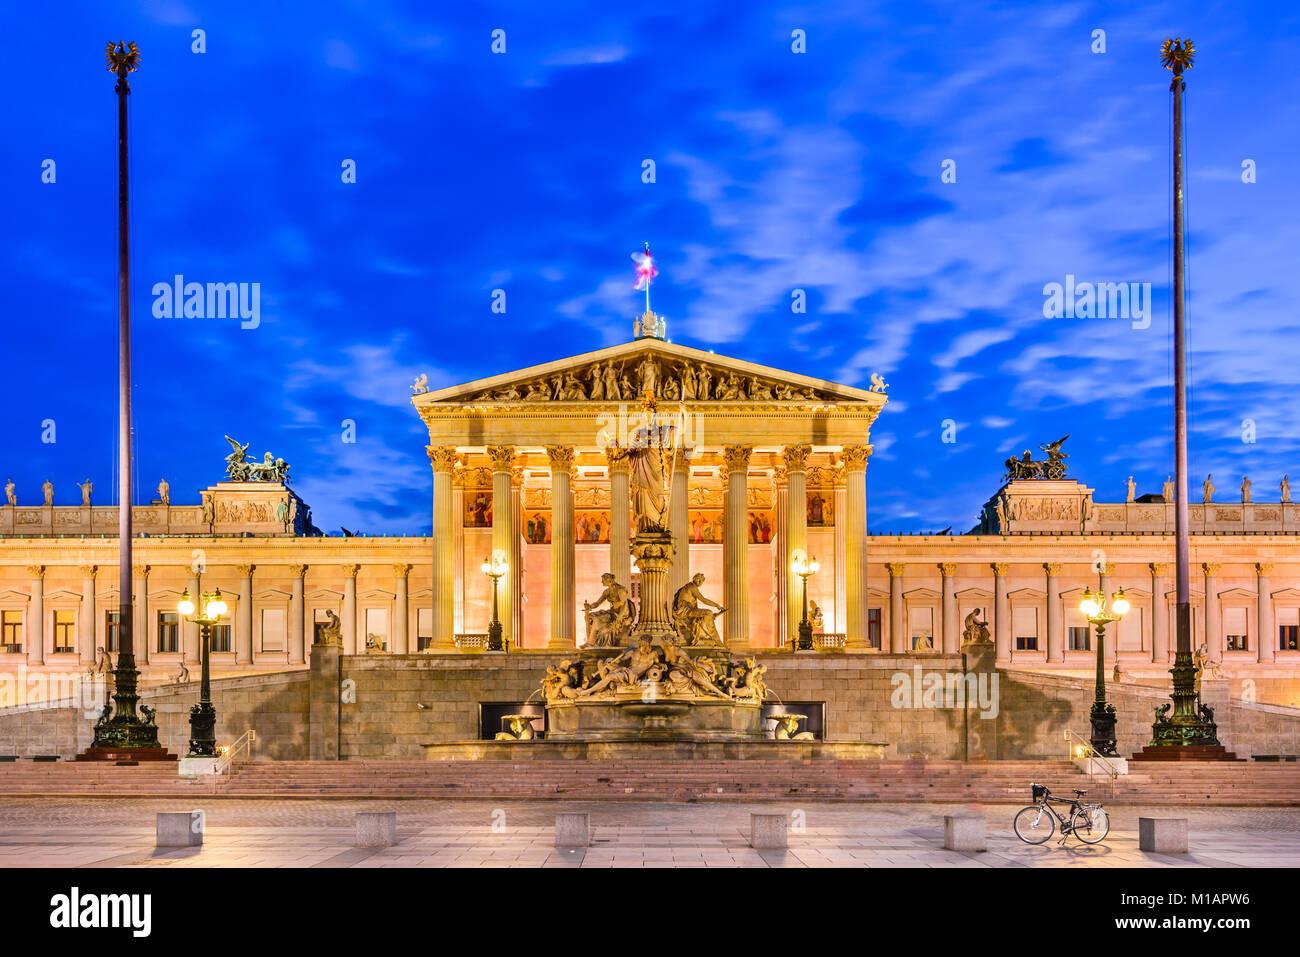 Vienna, Austria. Austrian parliament building, Ringstrasse, Innere Stadt in Wien. - Stock Image